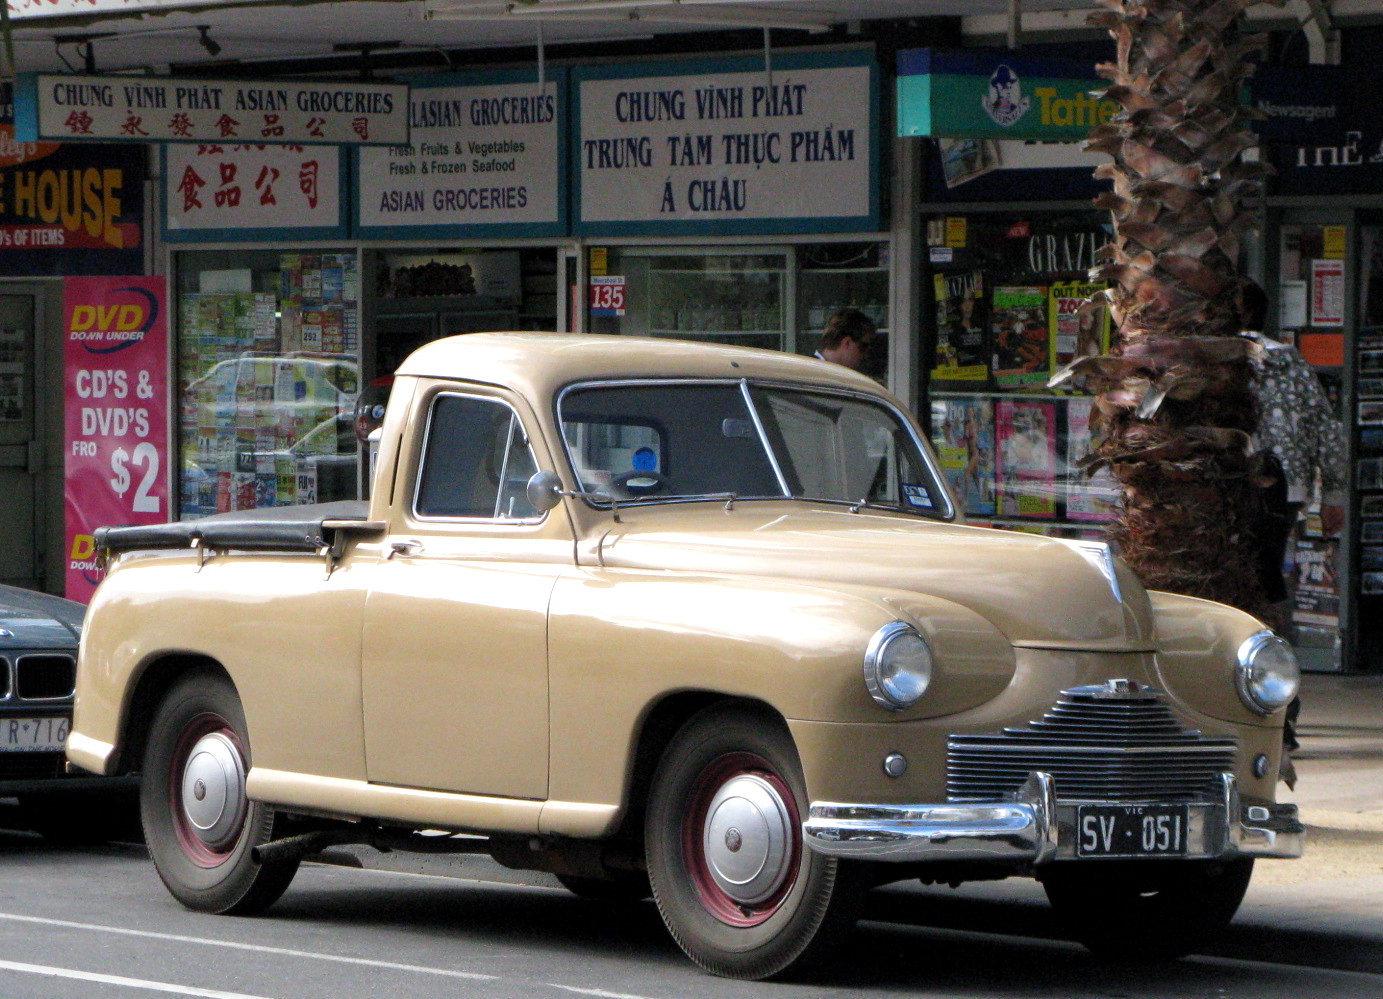 Dorable Vanguard Classics Cars Gallery - Classic Cars Ideas - boiq.info